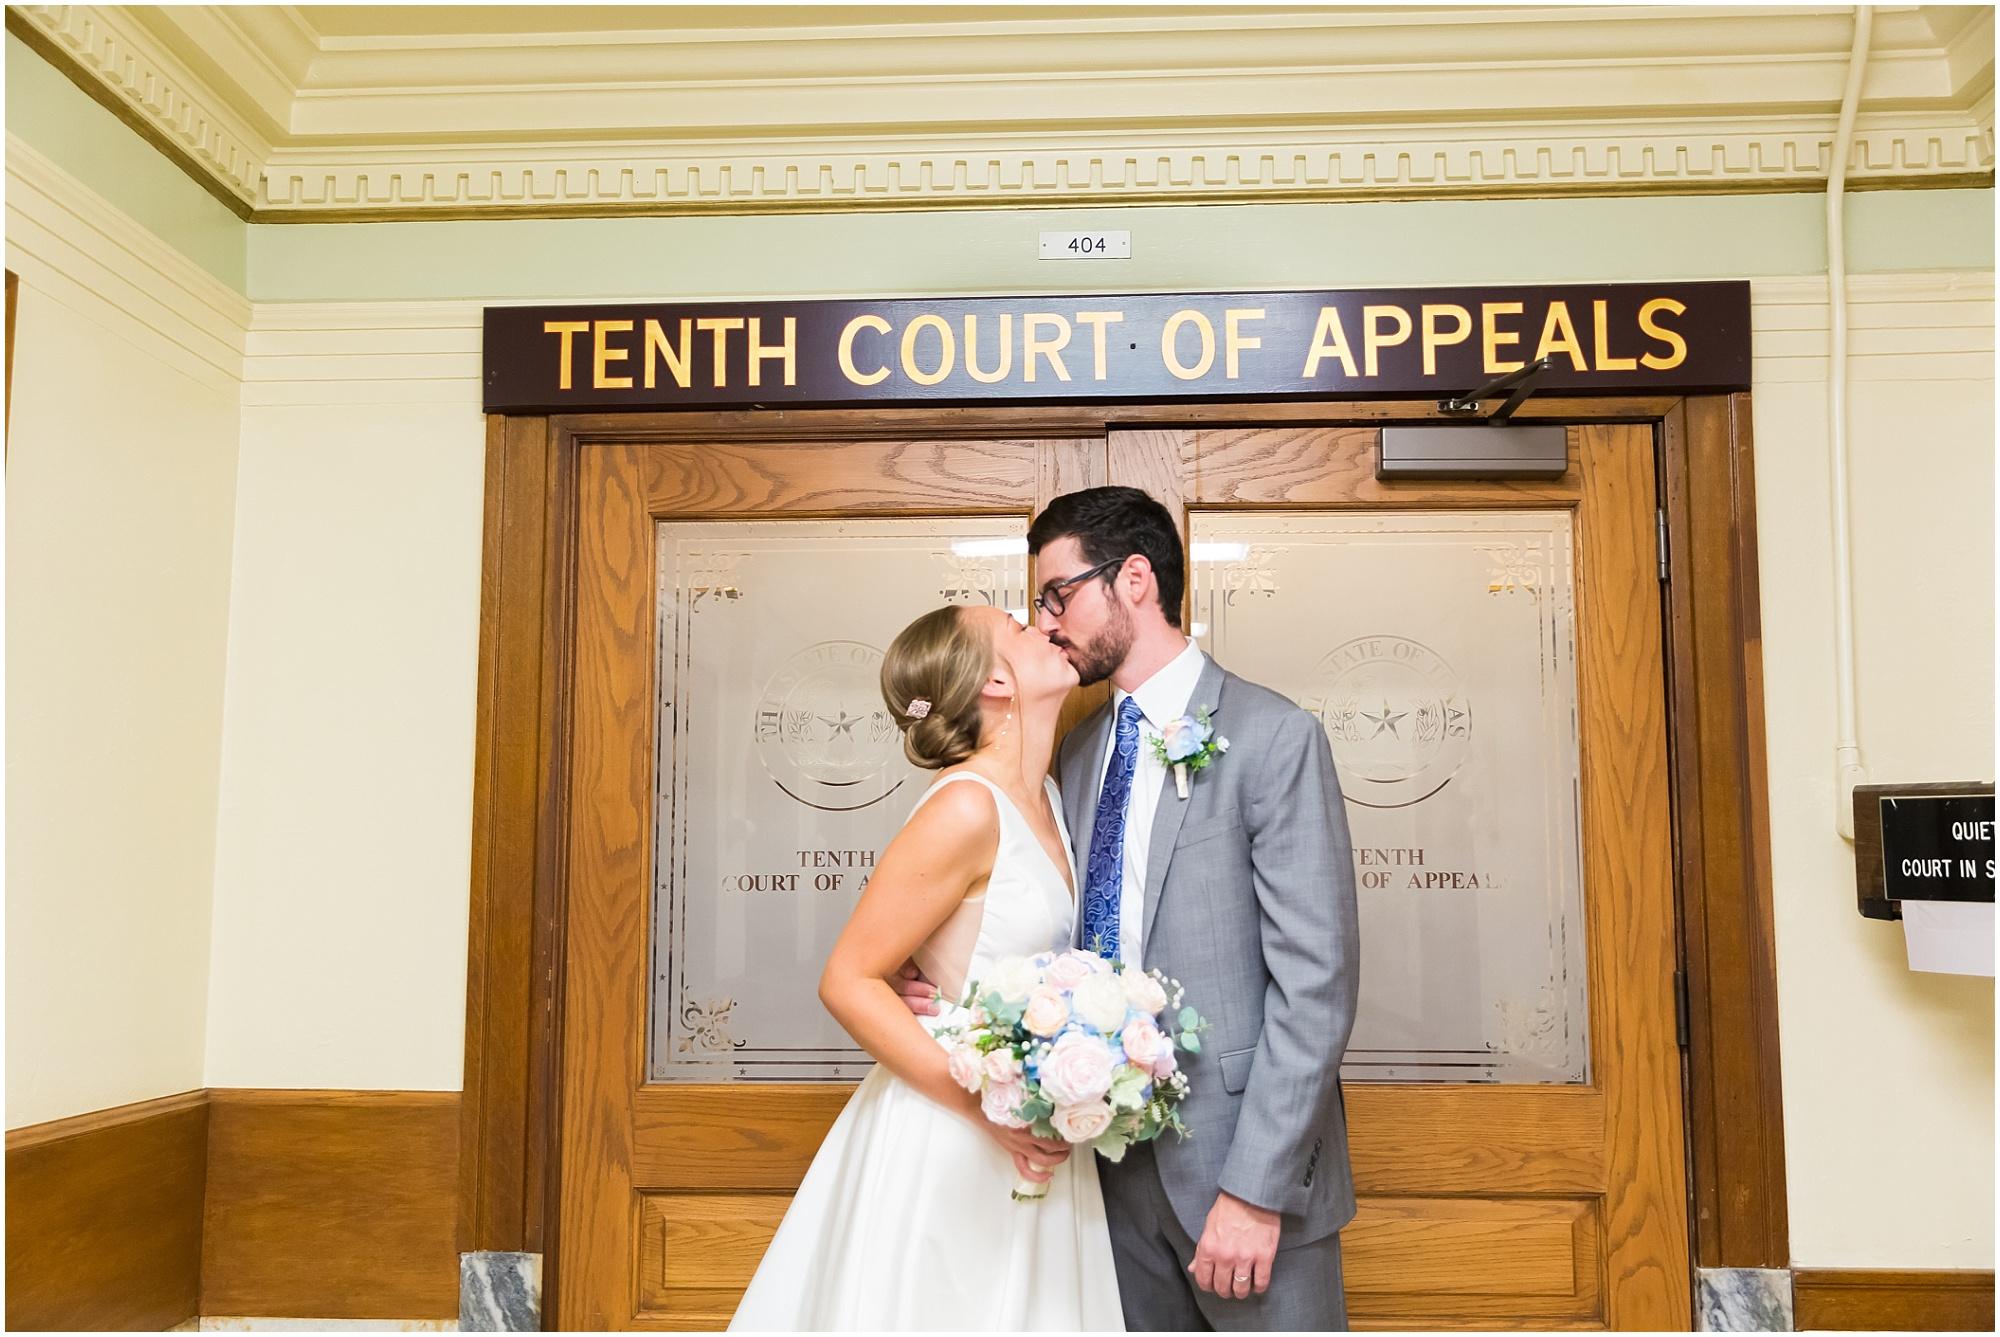 Courthouse-Wedding-Waco-Texas_0020.jpg